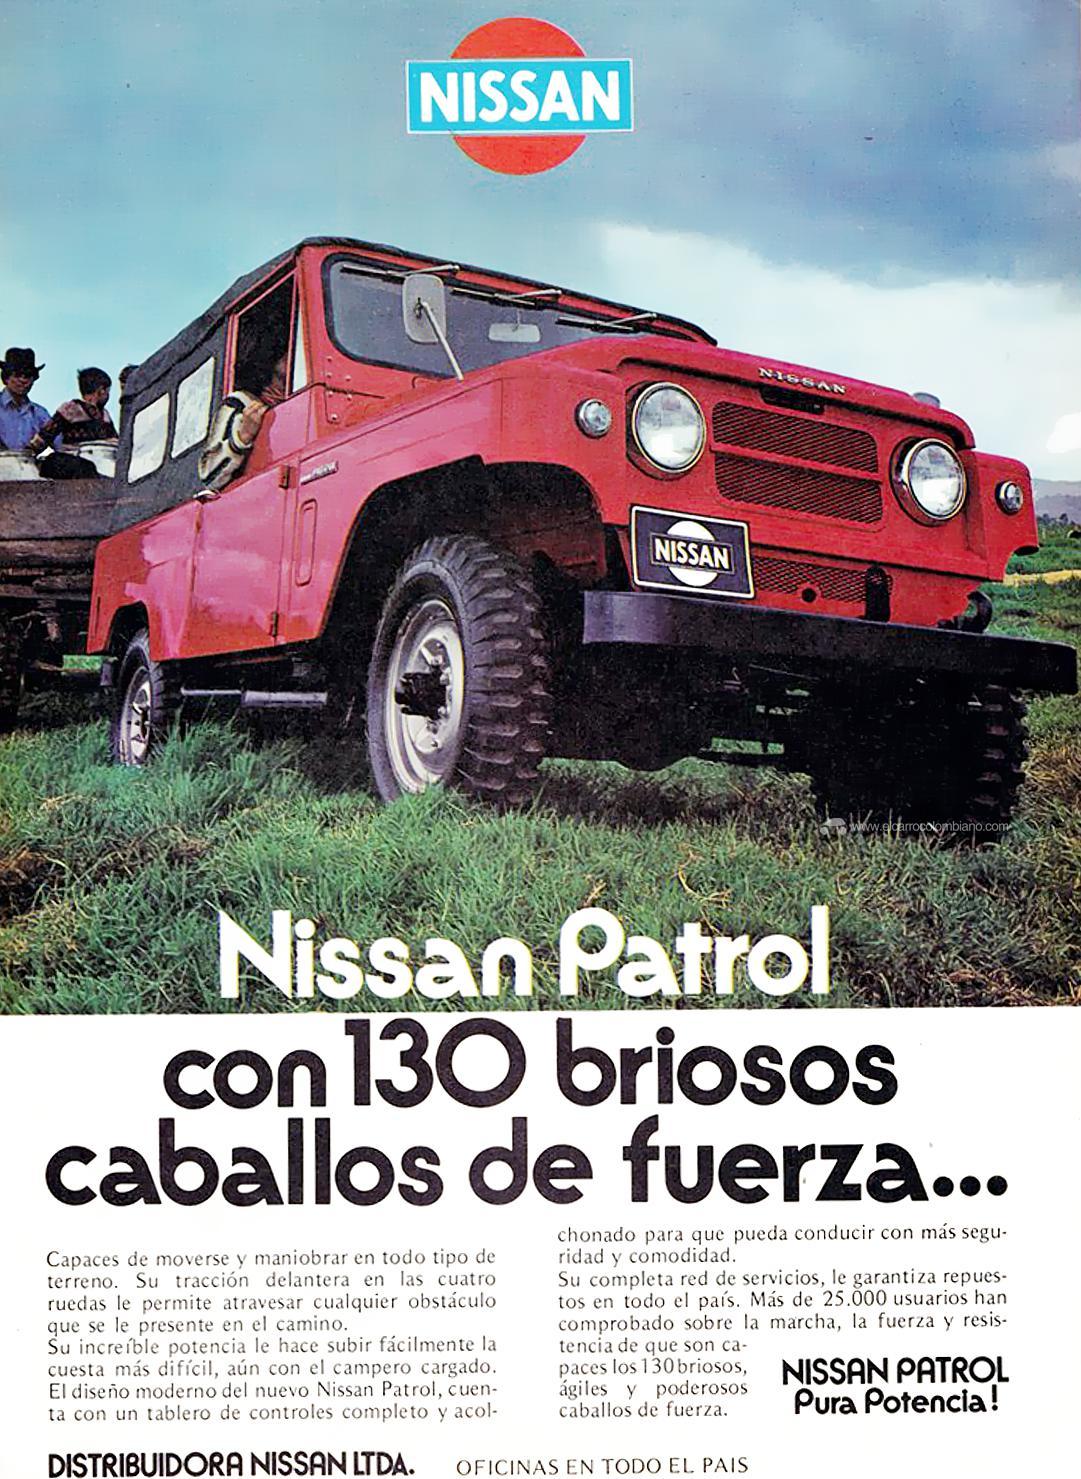 nissan patrol, nissan patrol 60, nissan patrol g60, nissan patrol colombia, nissan patrol historia en colombia, nissan patrol g60 en colombia, nissan patrol g60 historia en colombia, nissan patrol publicidad en colombia, nissan patrol g60 publicidad en colombia, camperos en colombia, nissan patrol antiguo, nissan patrol antiguo en colombia, nissan patrol 1960, nissan patrol 1961, nissan patrol 1970, nissan patrol 1972, nissan patrol 1979, nissan patrol 1980, nissan patrol samurai, nissan patrol samurai colombia